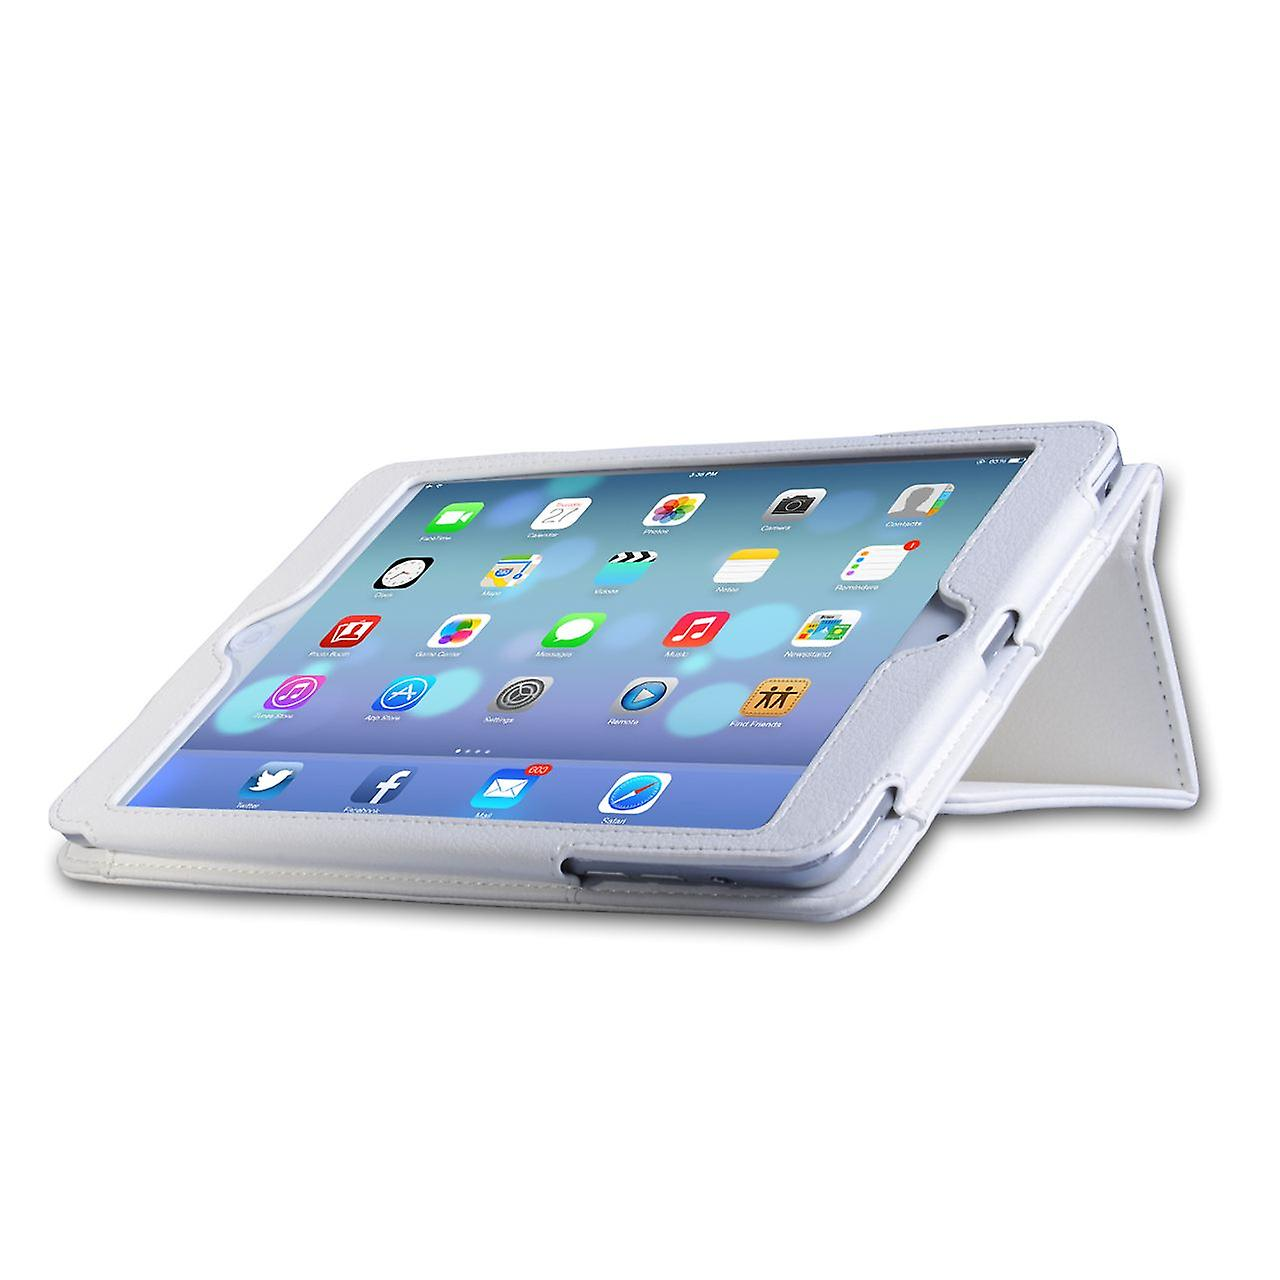 Caseflex Ipad Mini 2 Textured Leather-Effect Stand Case - White